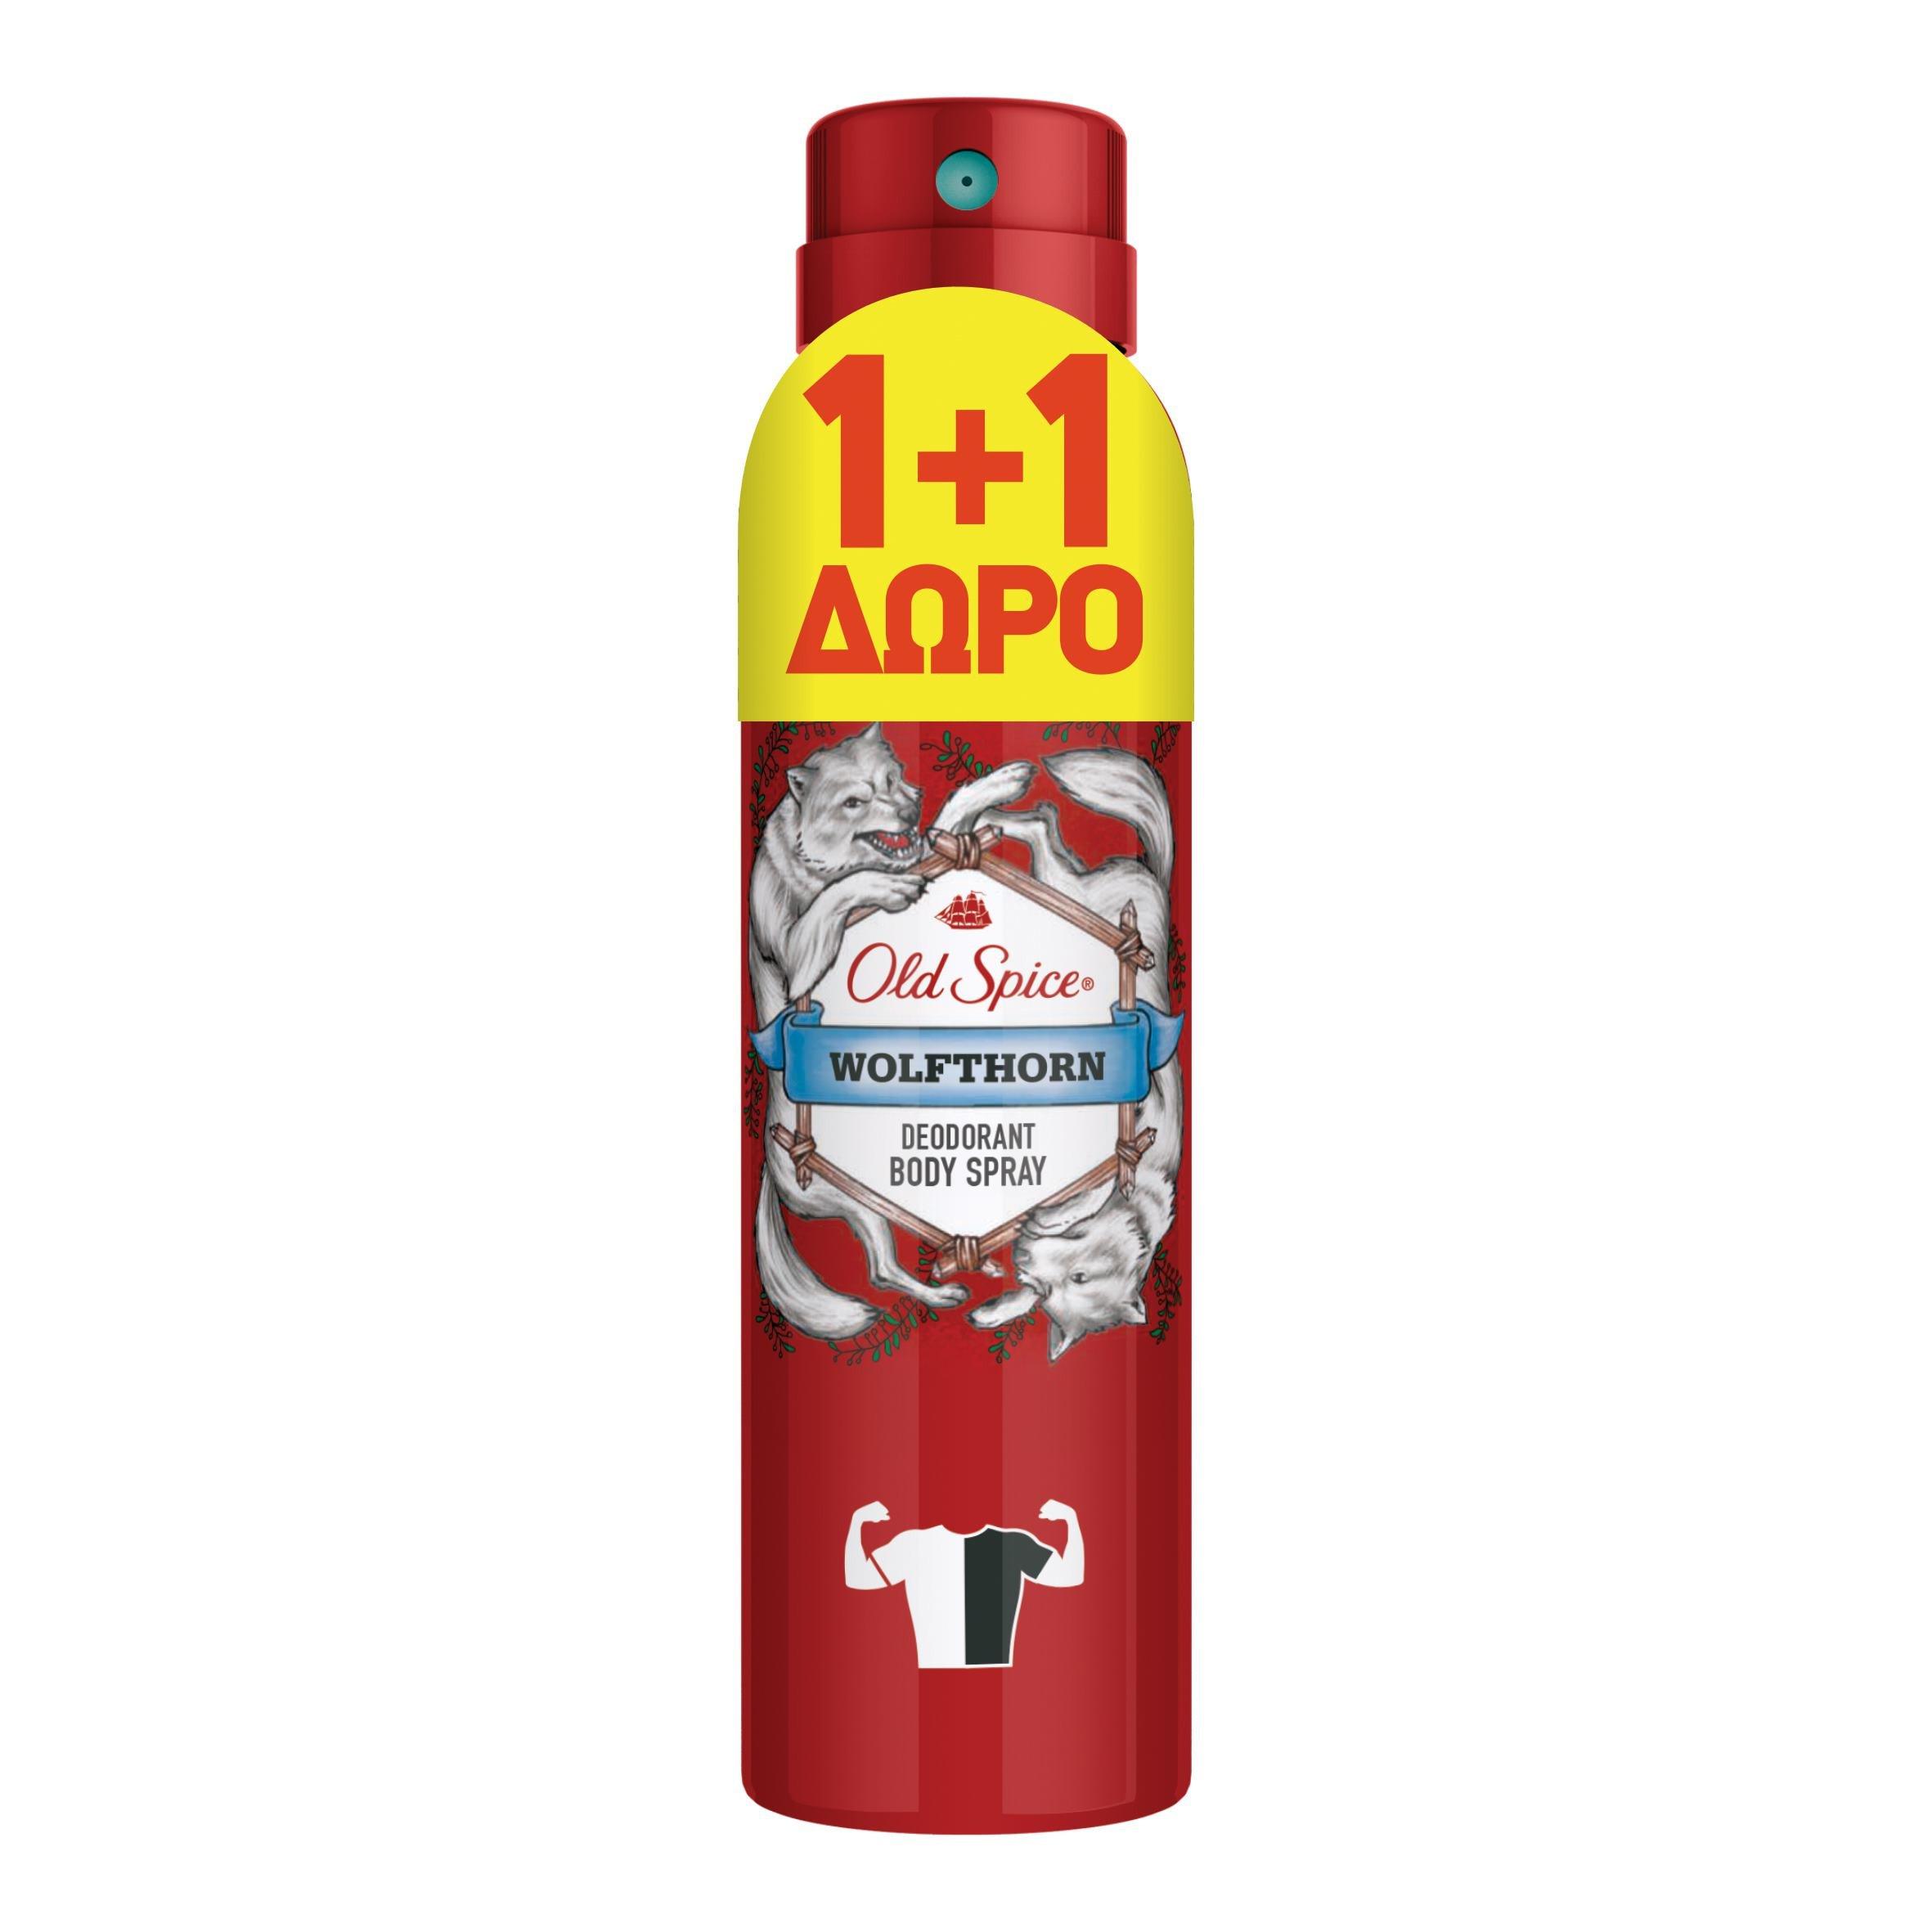 Old Spice Πακέτο Προσφοράς Wolfthorn Deodorant Body Spray Αποσμητικό με Δυναμικό Άρωμα Μόνο για Αληθινούς Άντρες 2x150ml